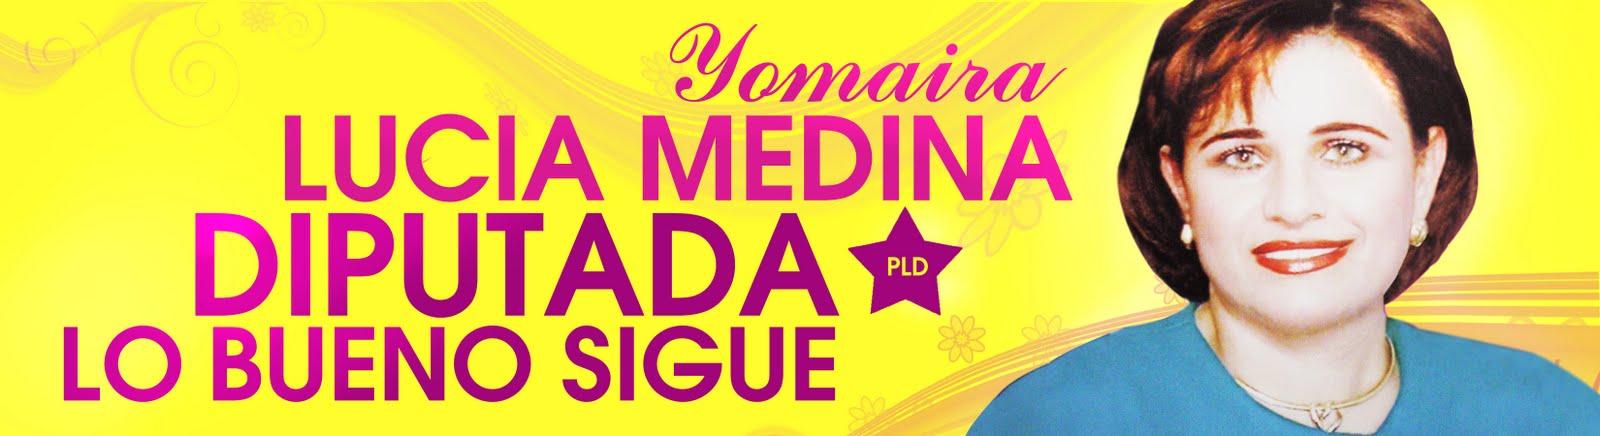 Lucia Medina Diputada